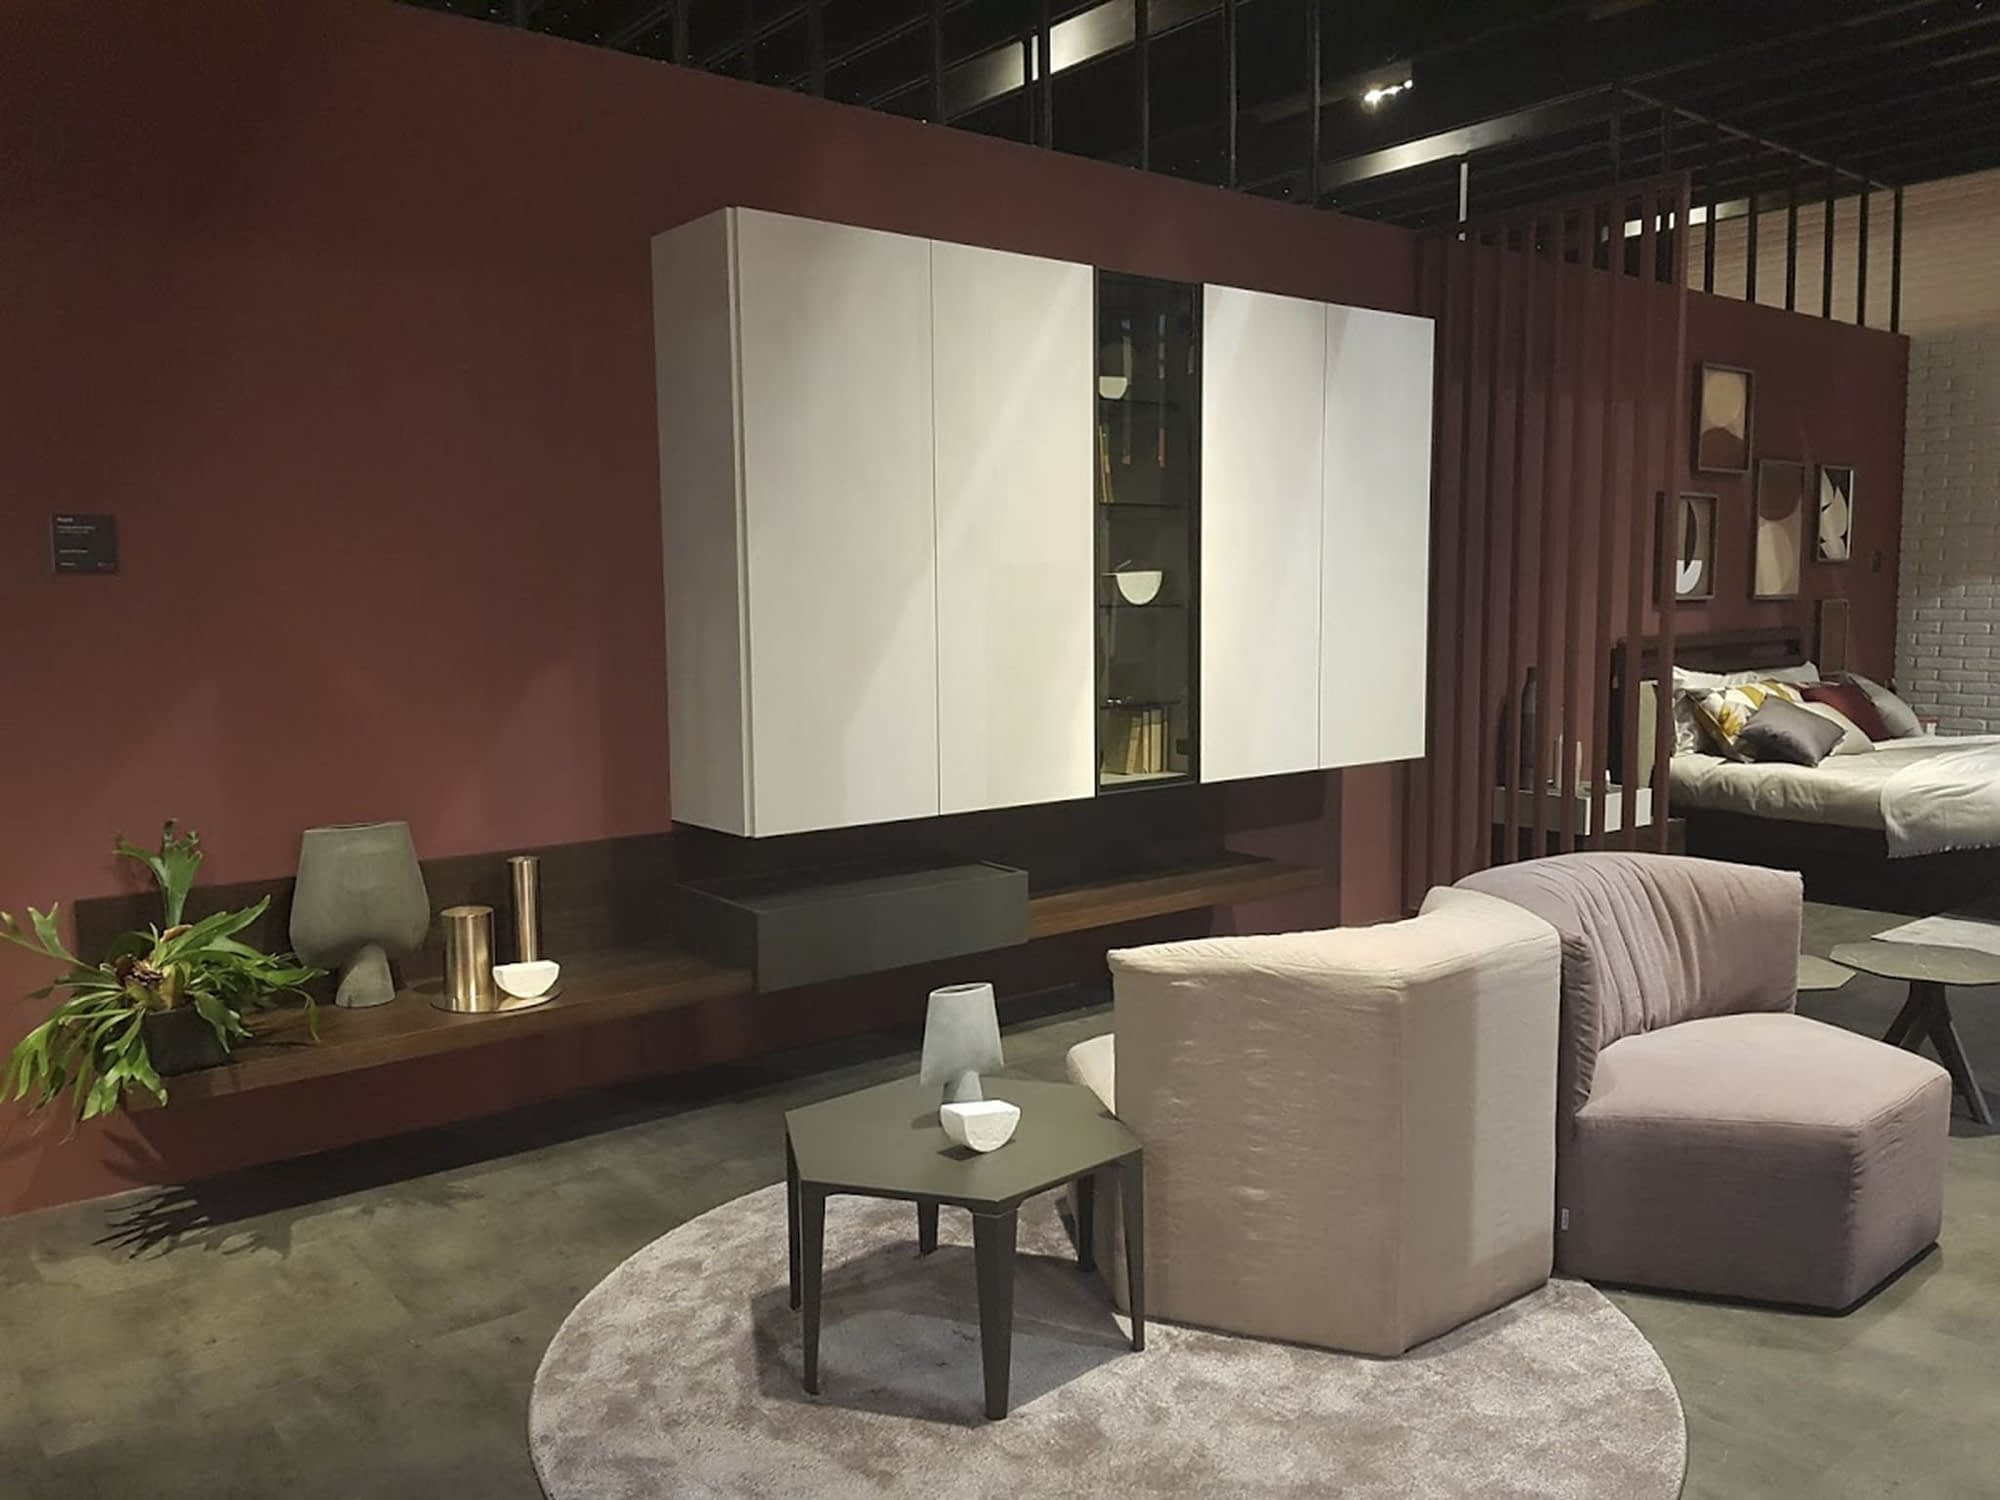 Milano Design Week 2018 - Salone del Mobile 60